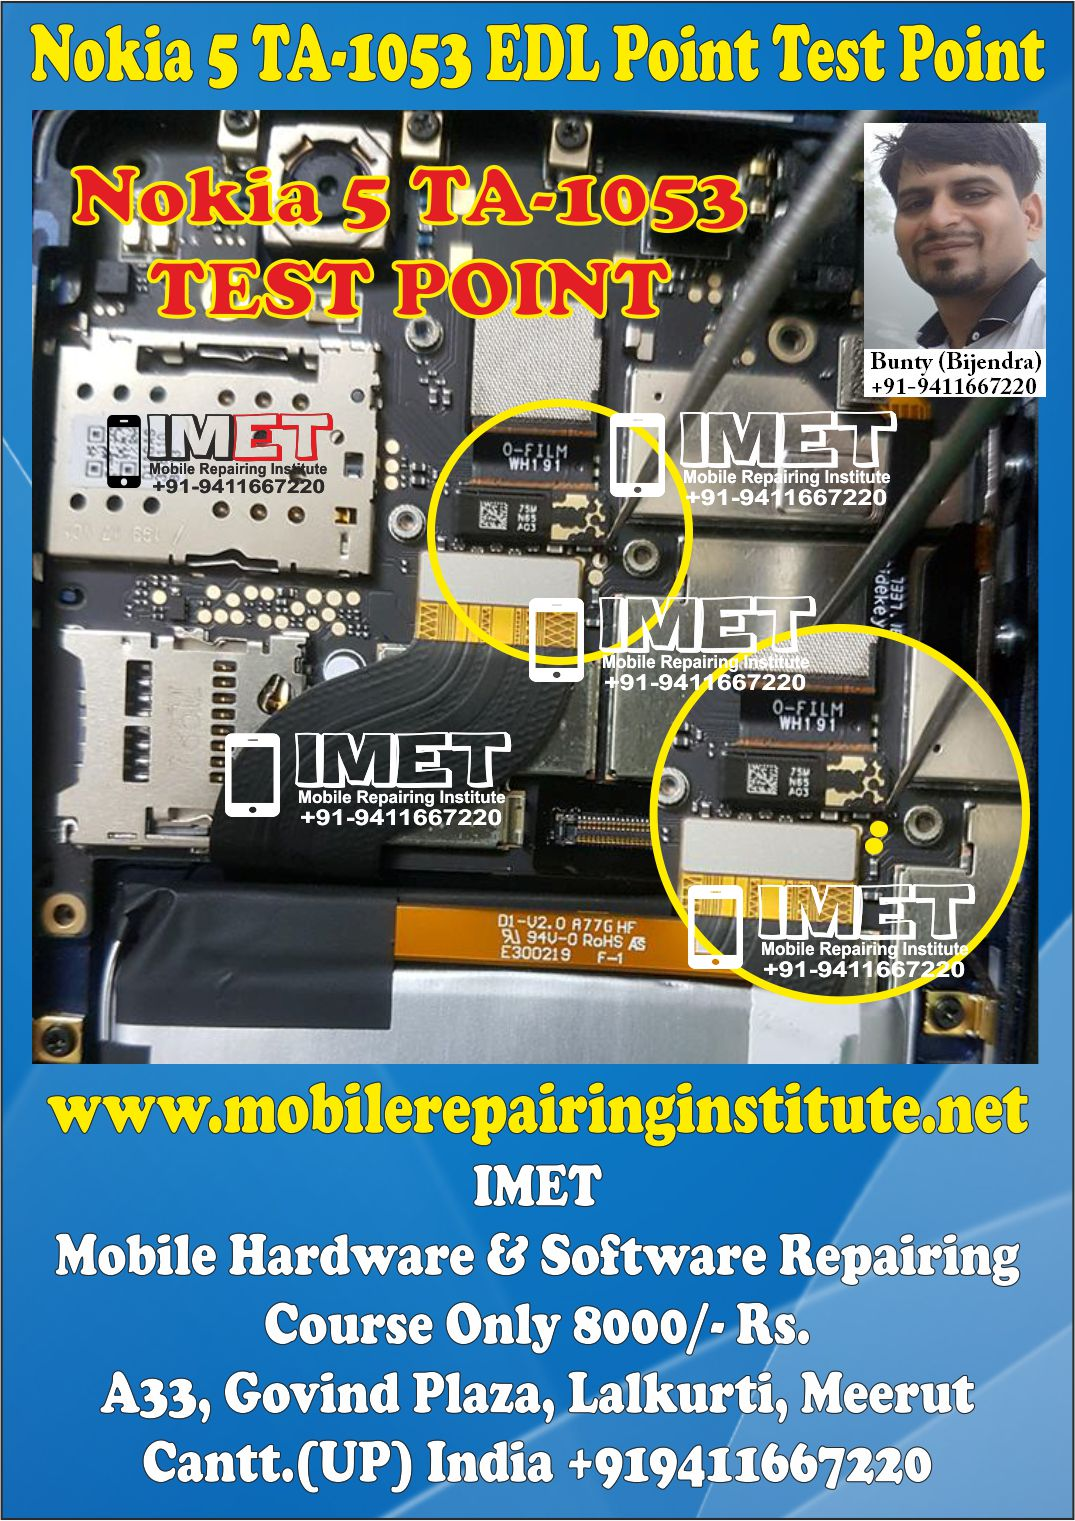 Nokia 5 TA-1053 EDL Point Test Point - IMET Mobile Repairing